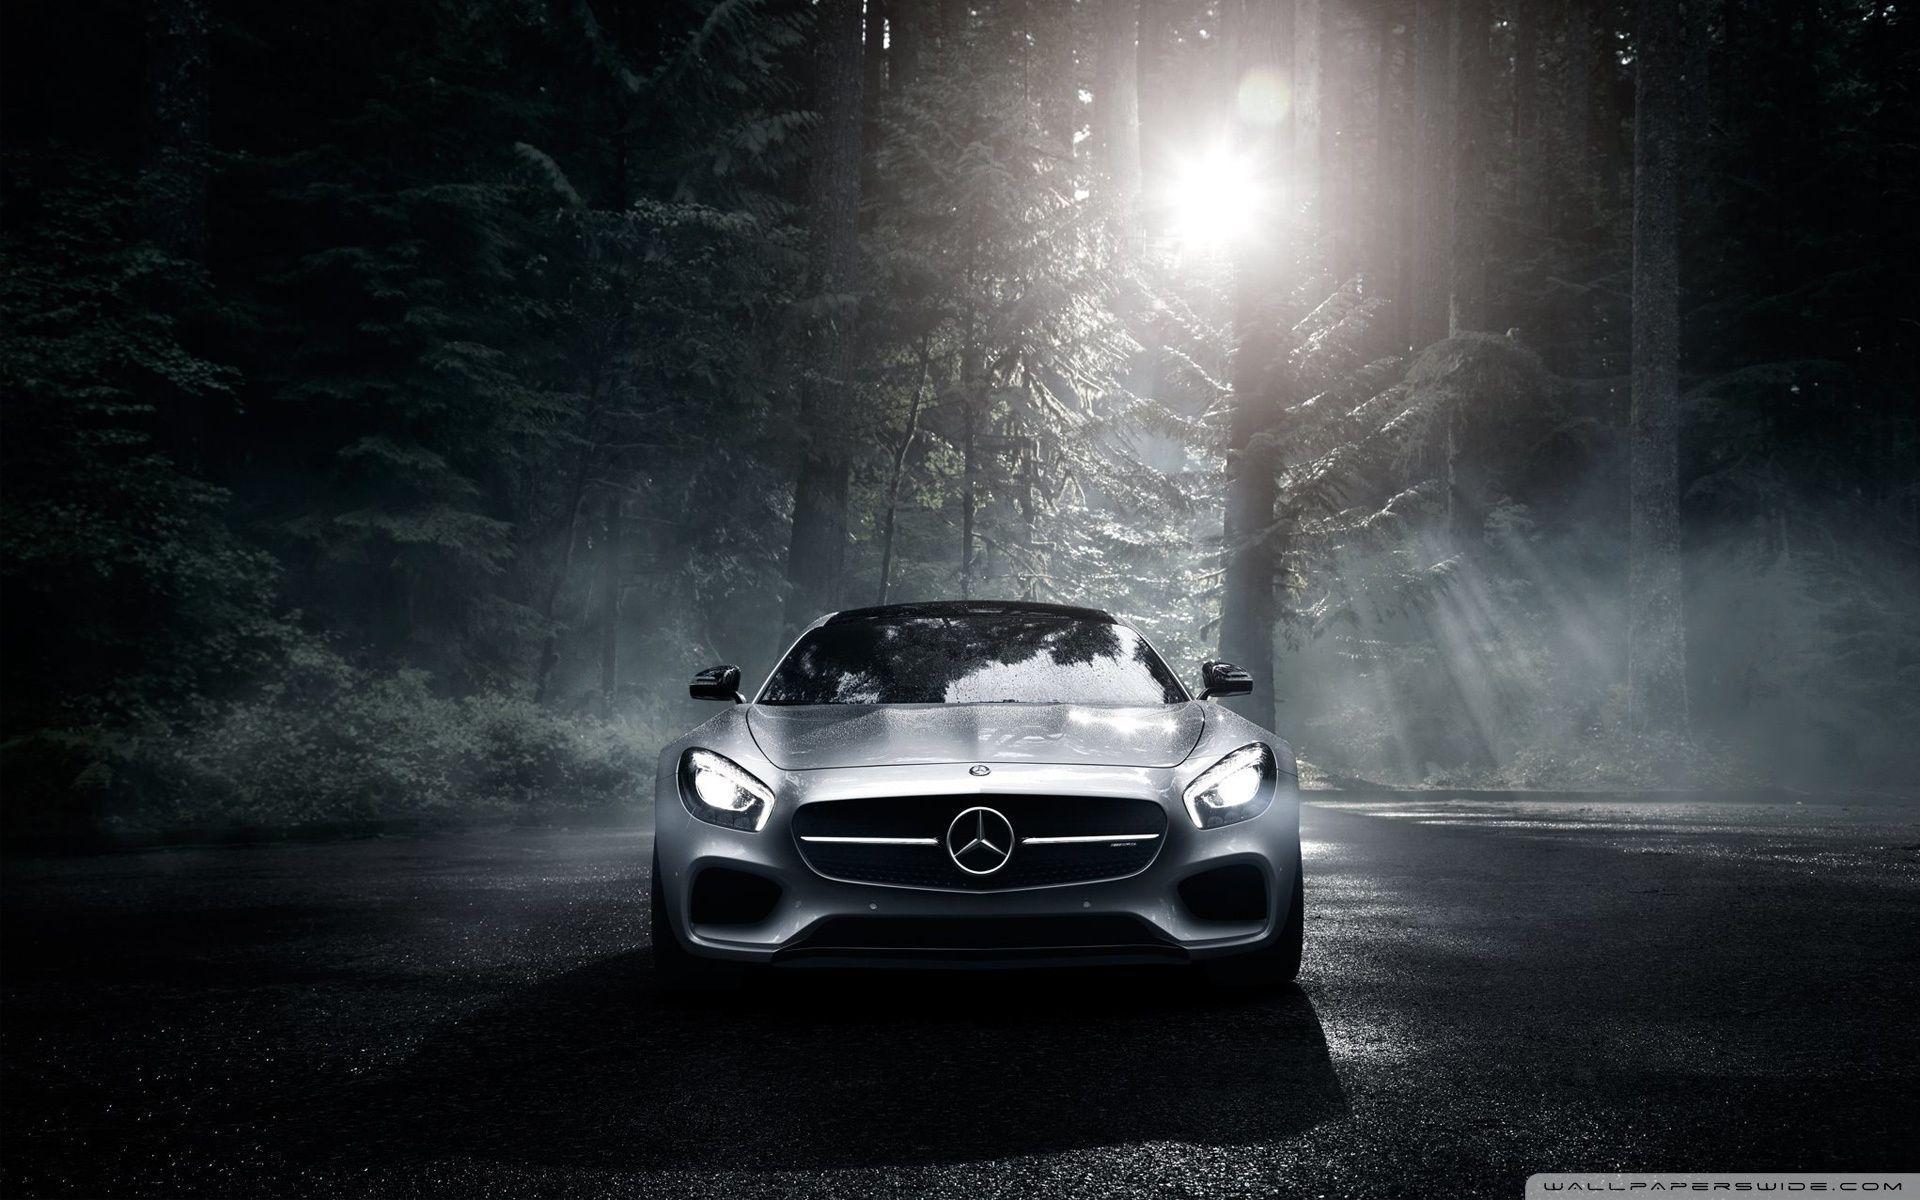 Mercedes Wallpapers - Top Free Mercedes